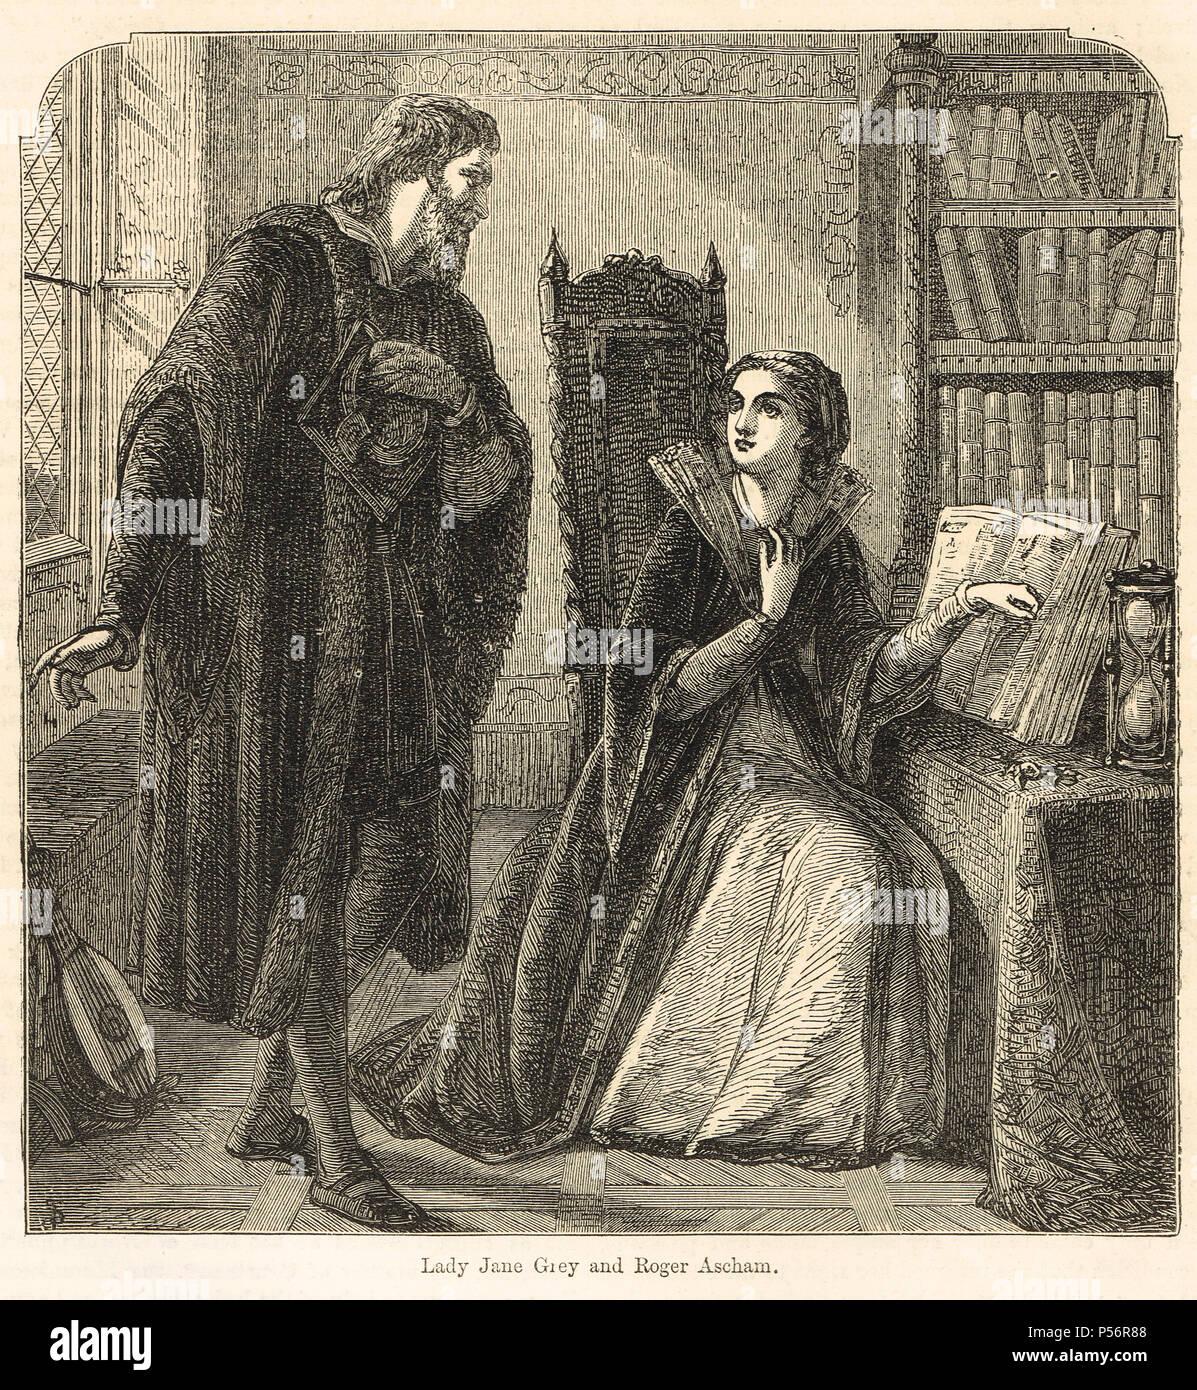 Lady Jane Grey reading Plato's Phaedo, visited by Roger Ascham, 1550 - Stock Image